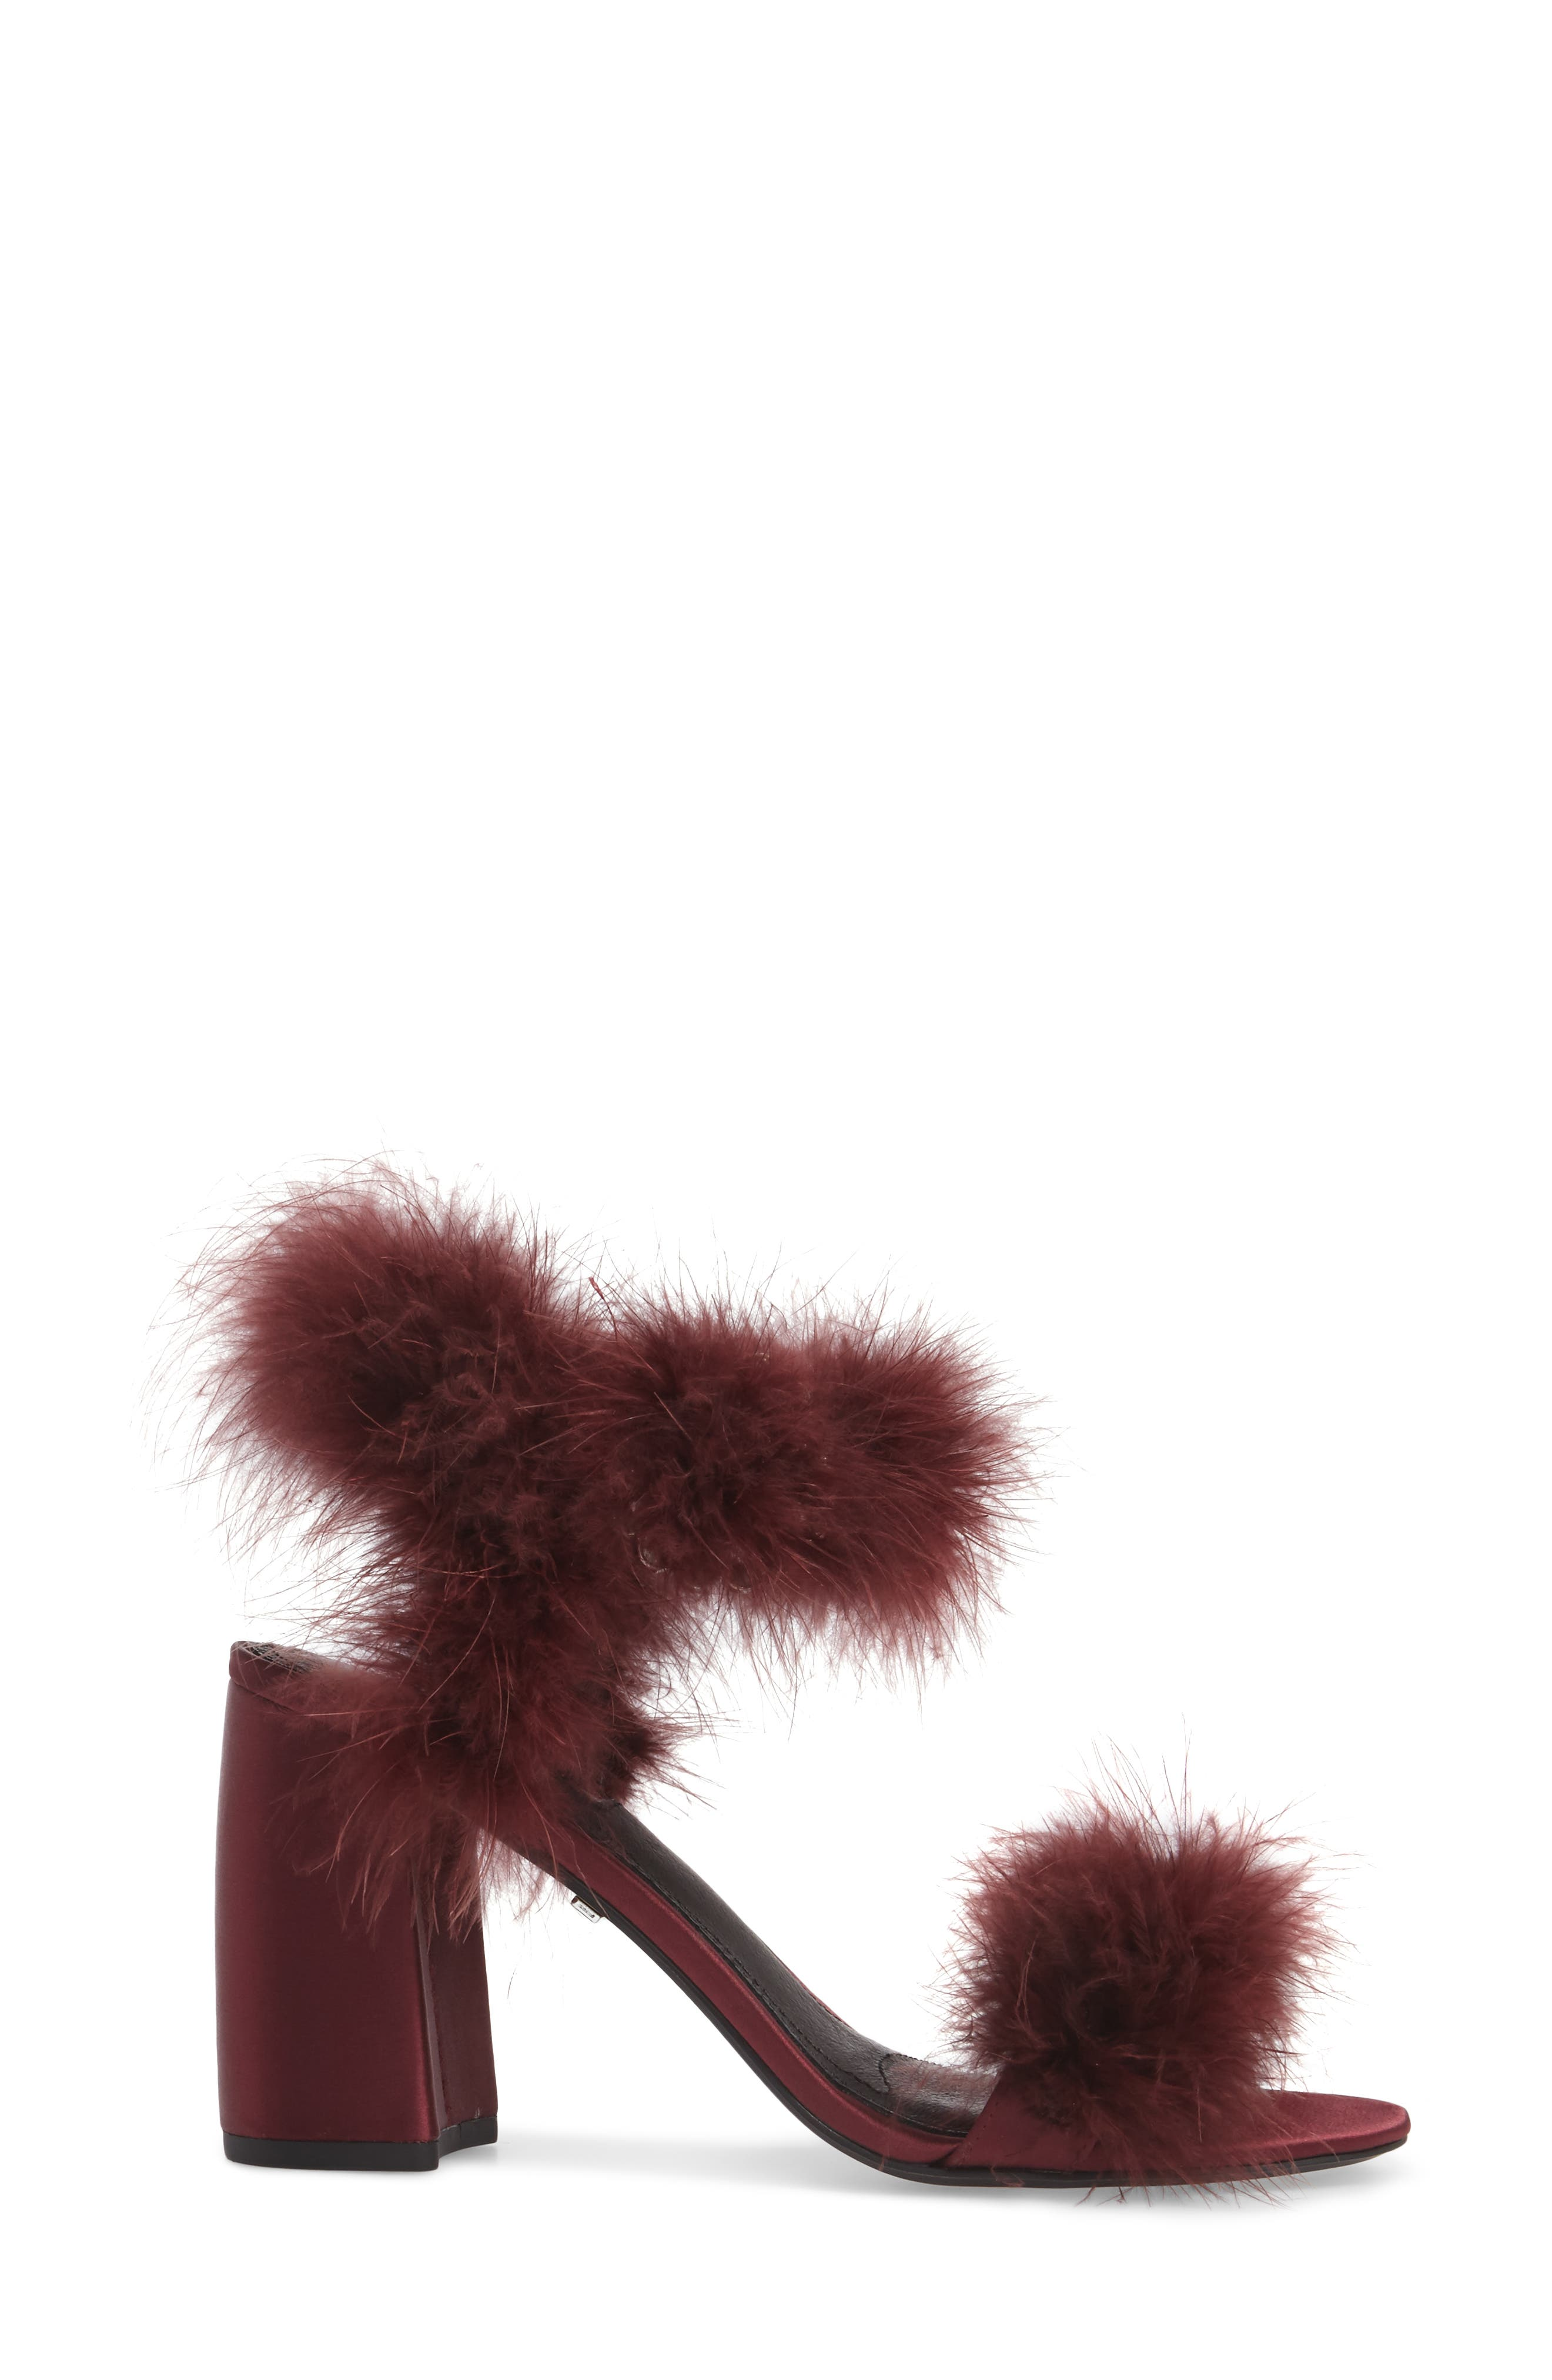 Maribou Feather Sandal,                             Alternate thumbnail 3, color,                             930